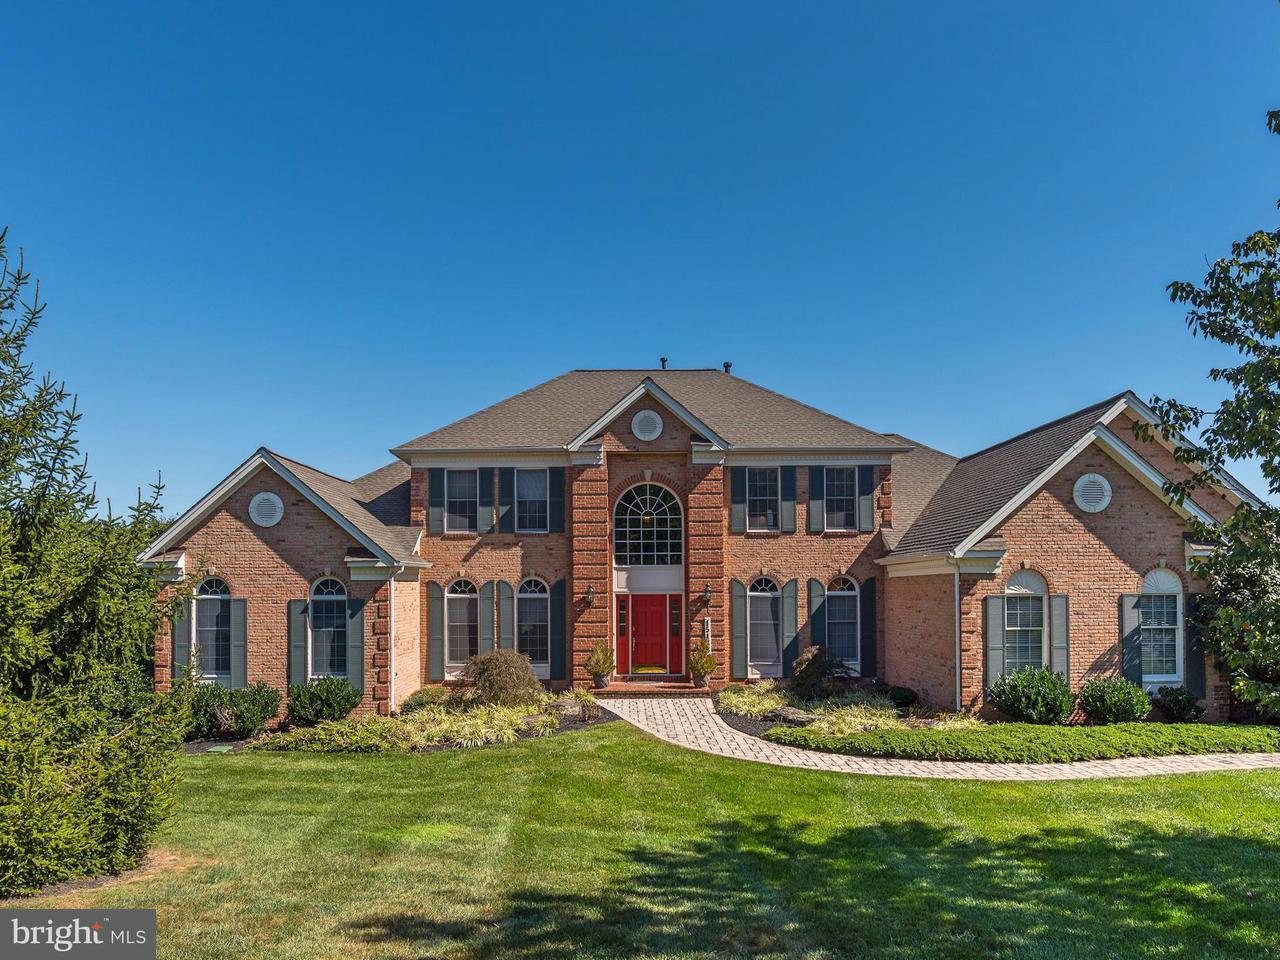 Moradia para Venda às 15178 Sapling Ridge Drive 15178 Sapling Ridge Drive Dayton, Maryland 21036 Estados Unidos